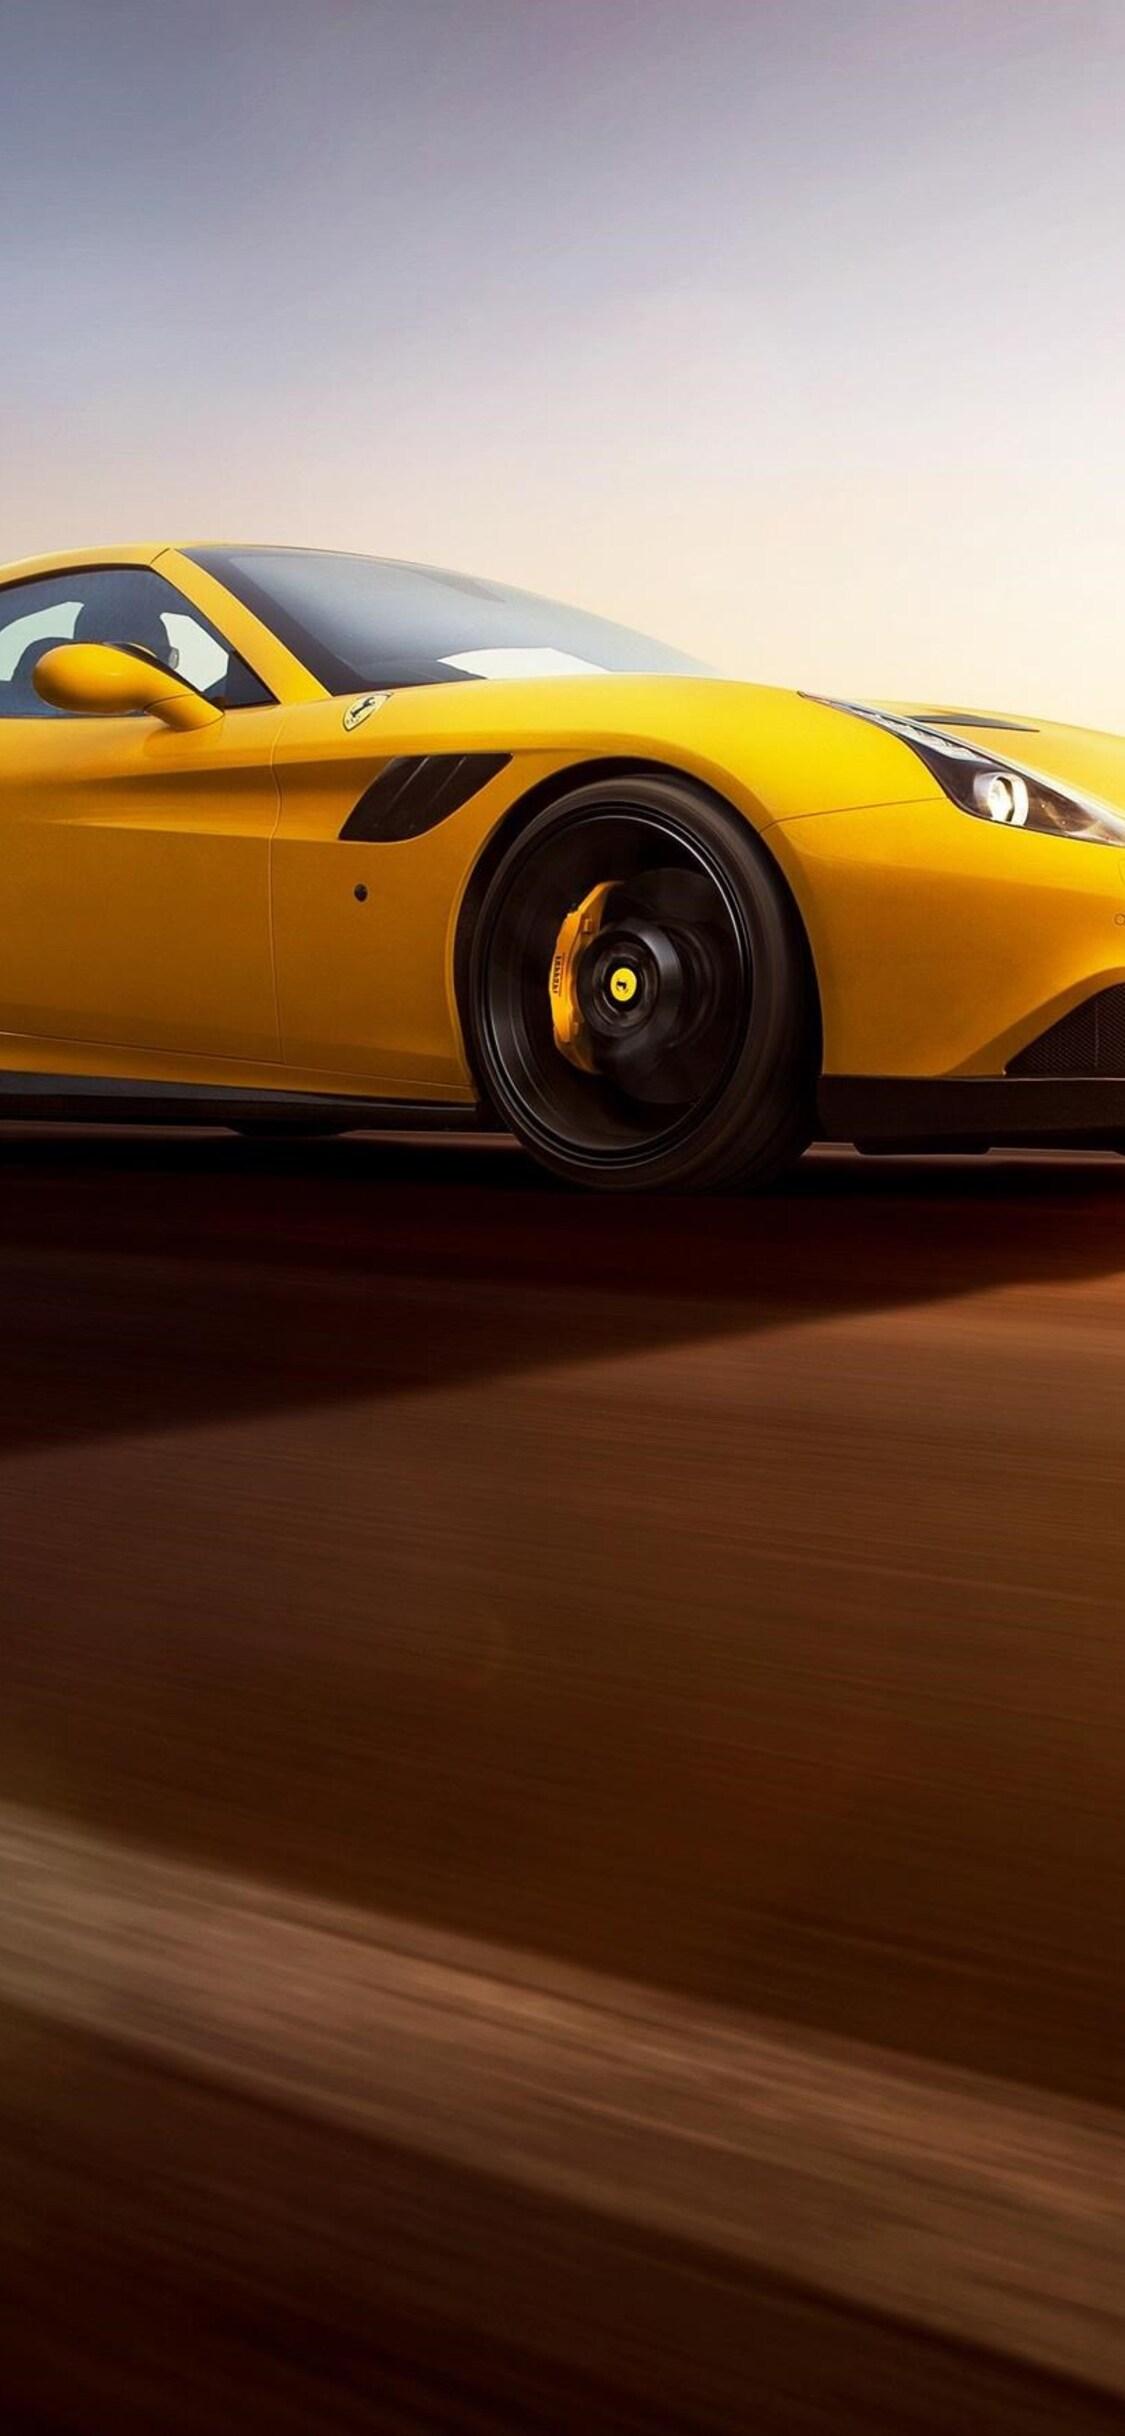 1125x2436 Ferrari California Iphone Xs Iphone 10 Iphone X Hd 4k